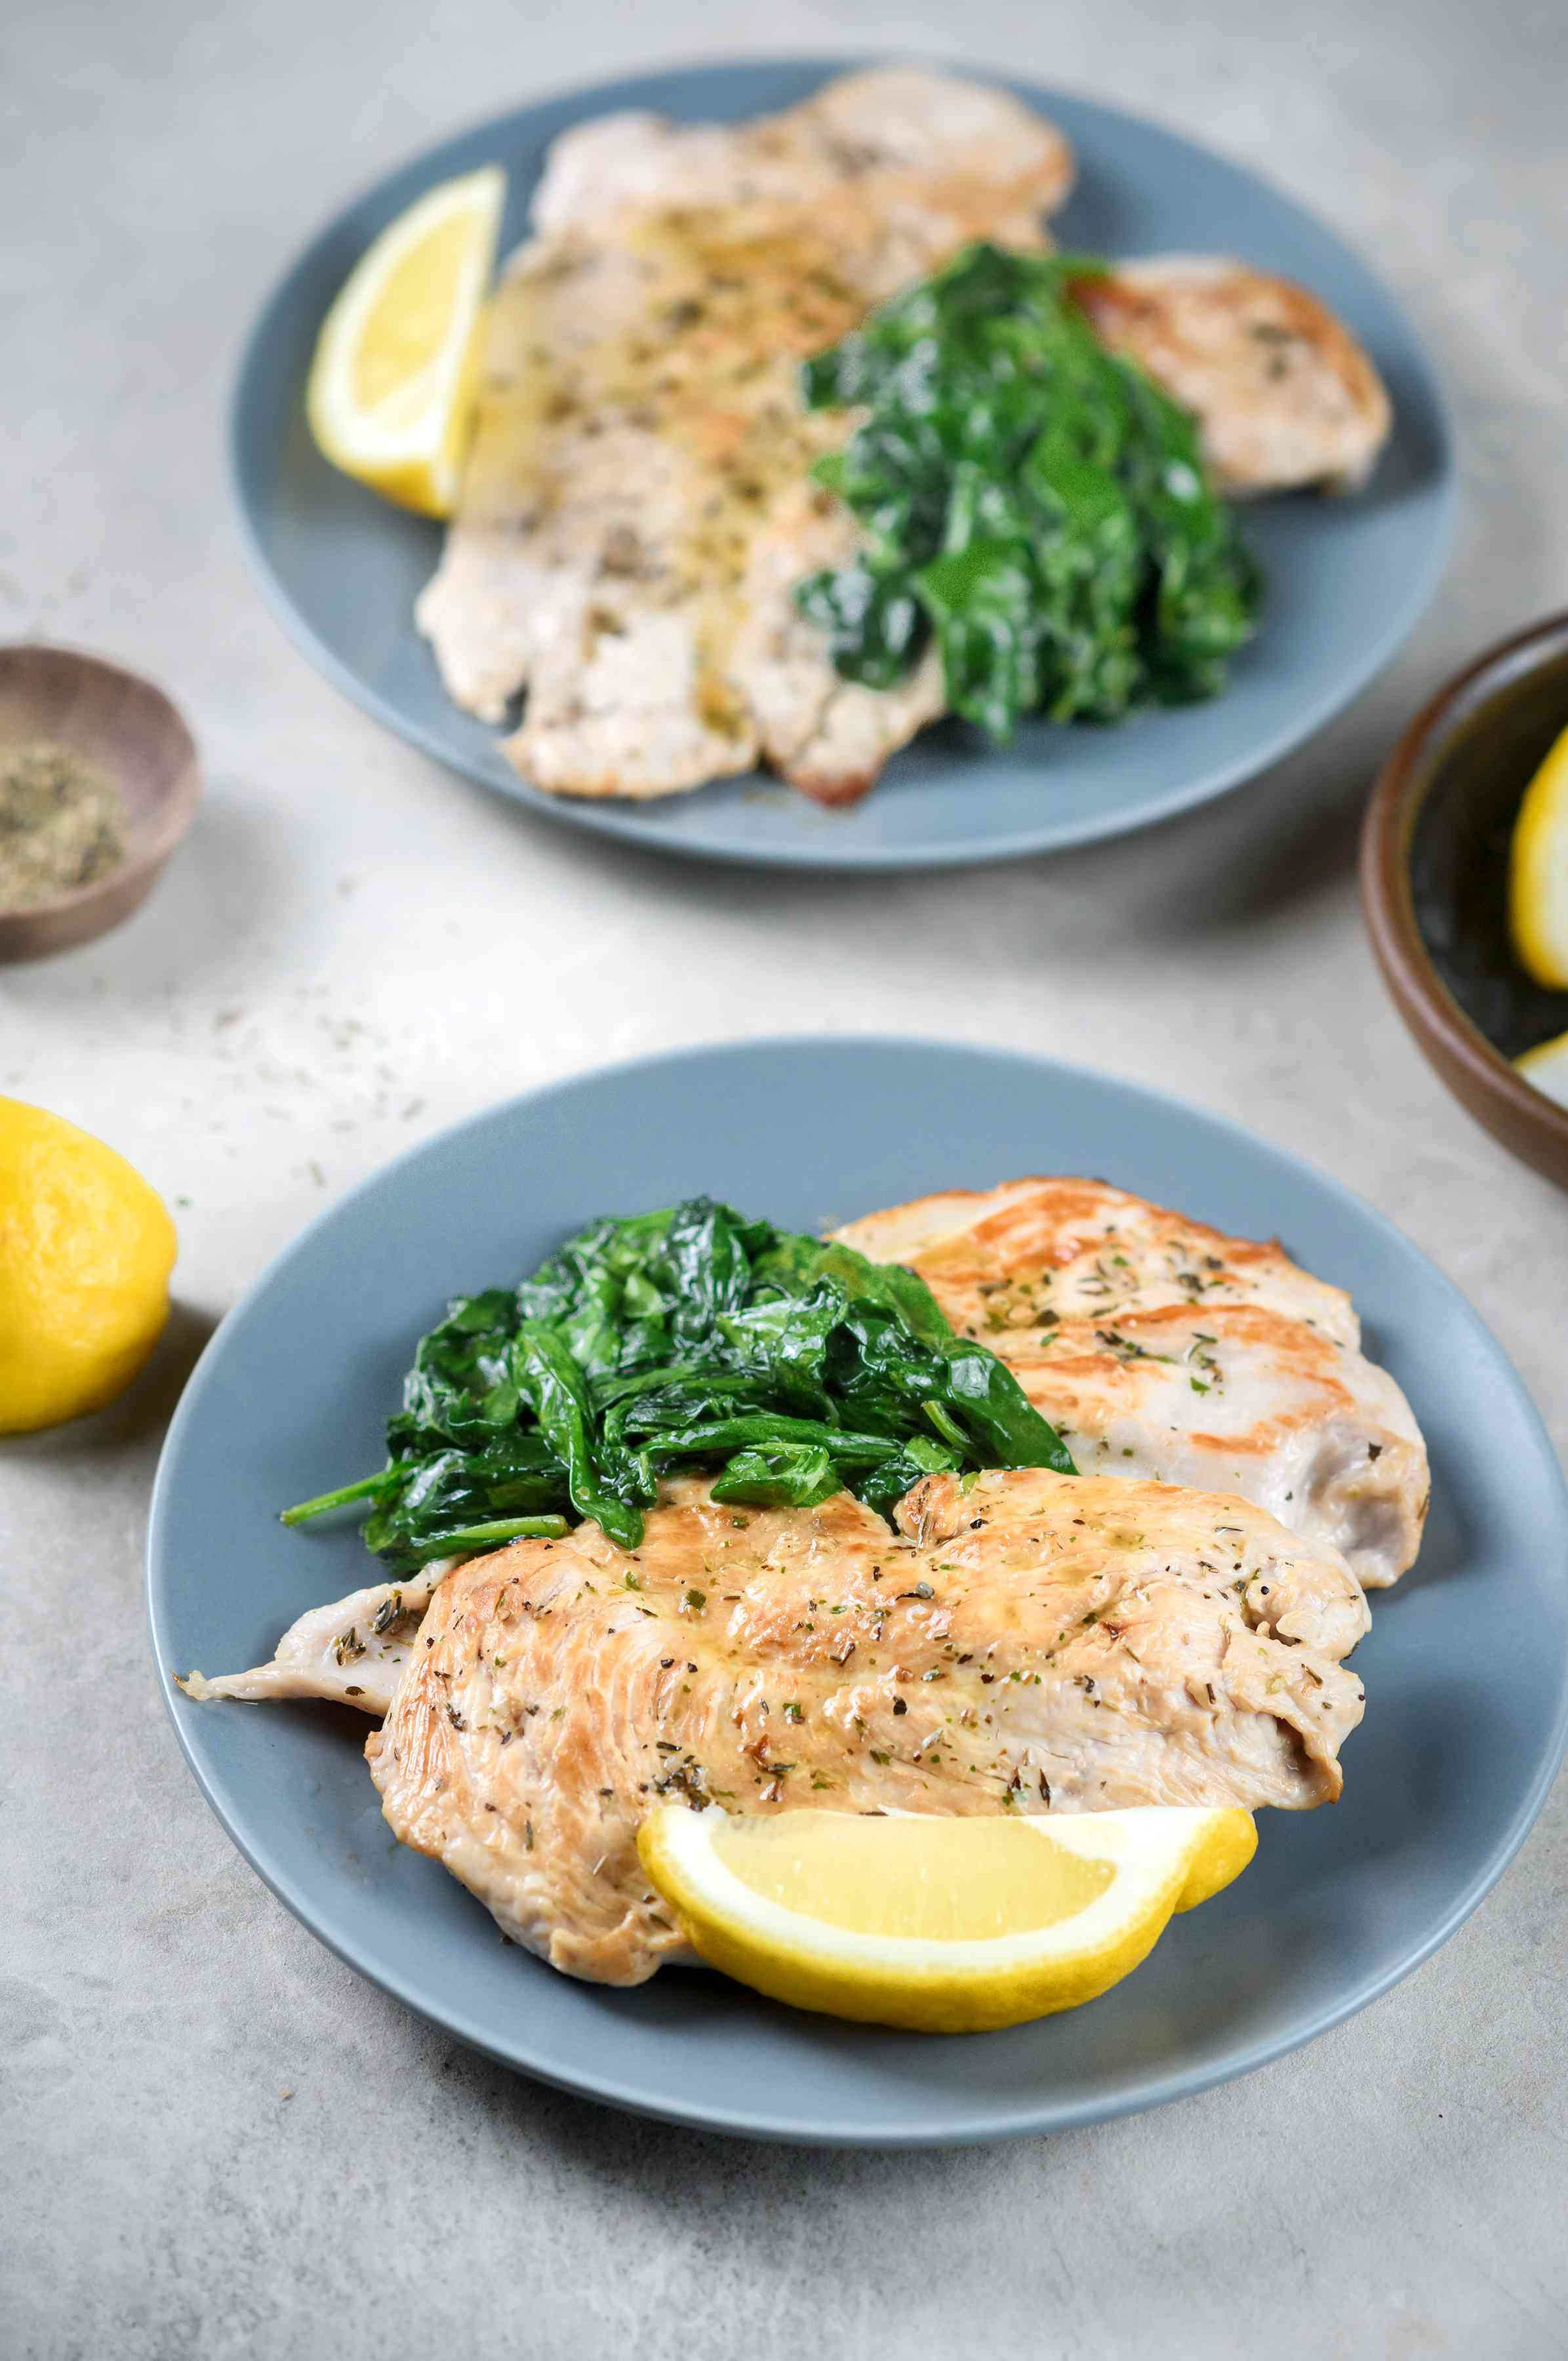 Plated greens, turkey breast, and lemon wedge garnish on plate